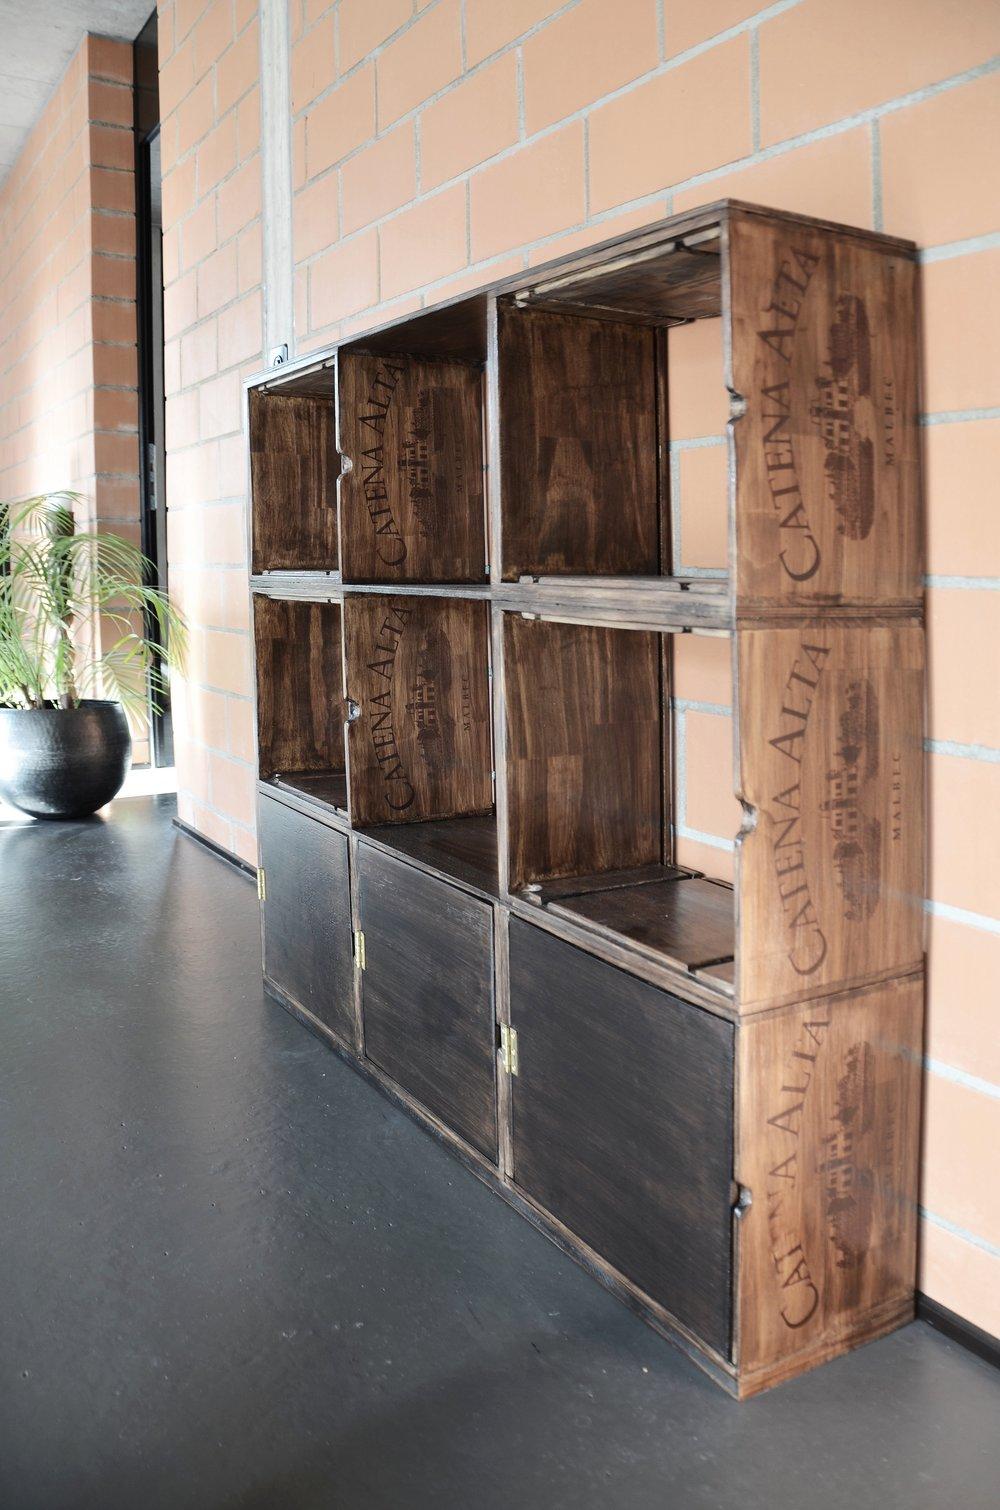 uniqamo_furniture_design_upcycled.jpg